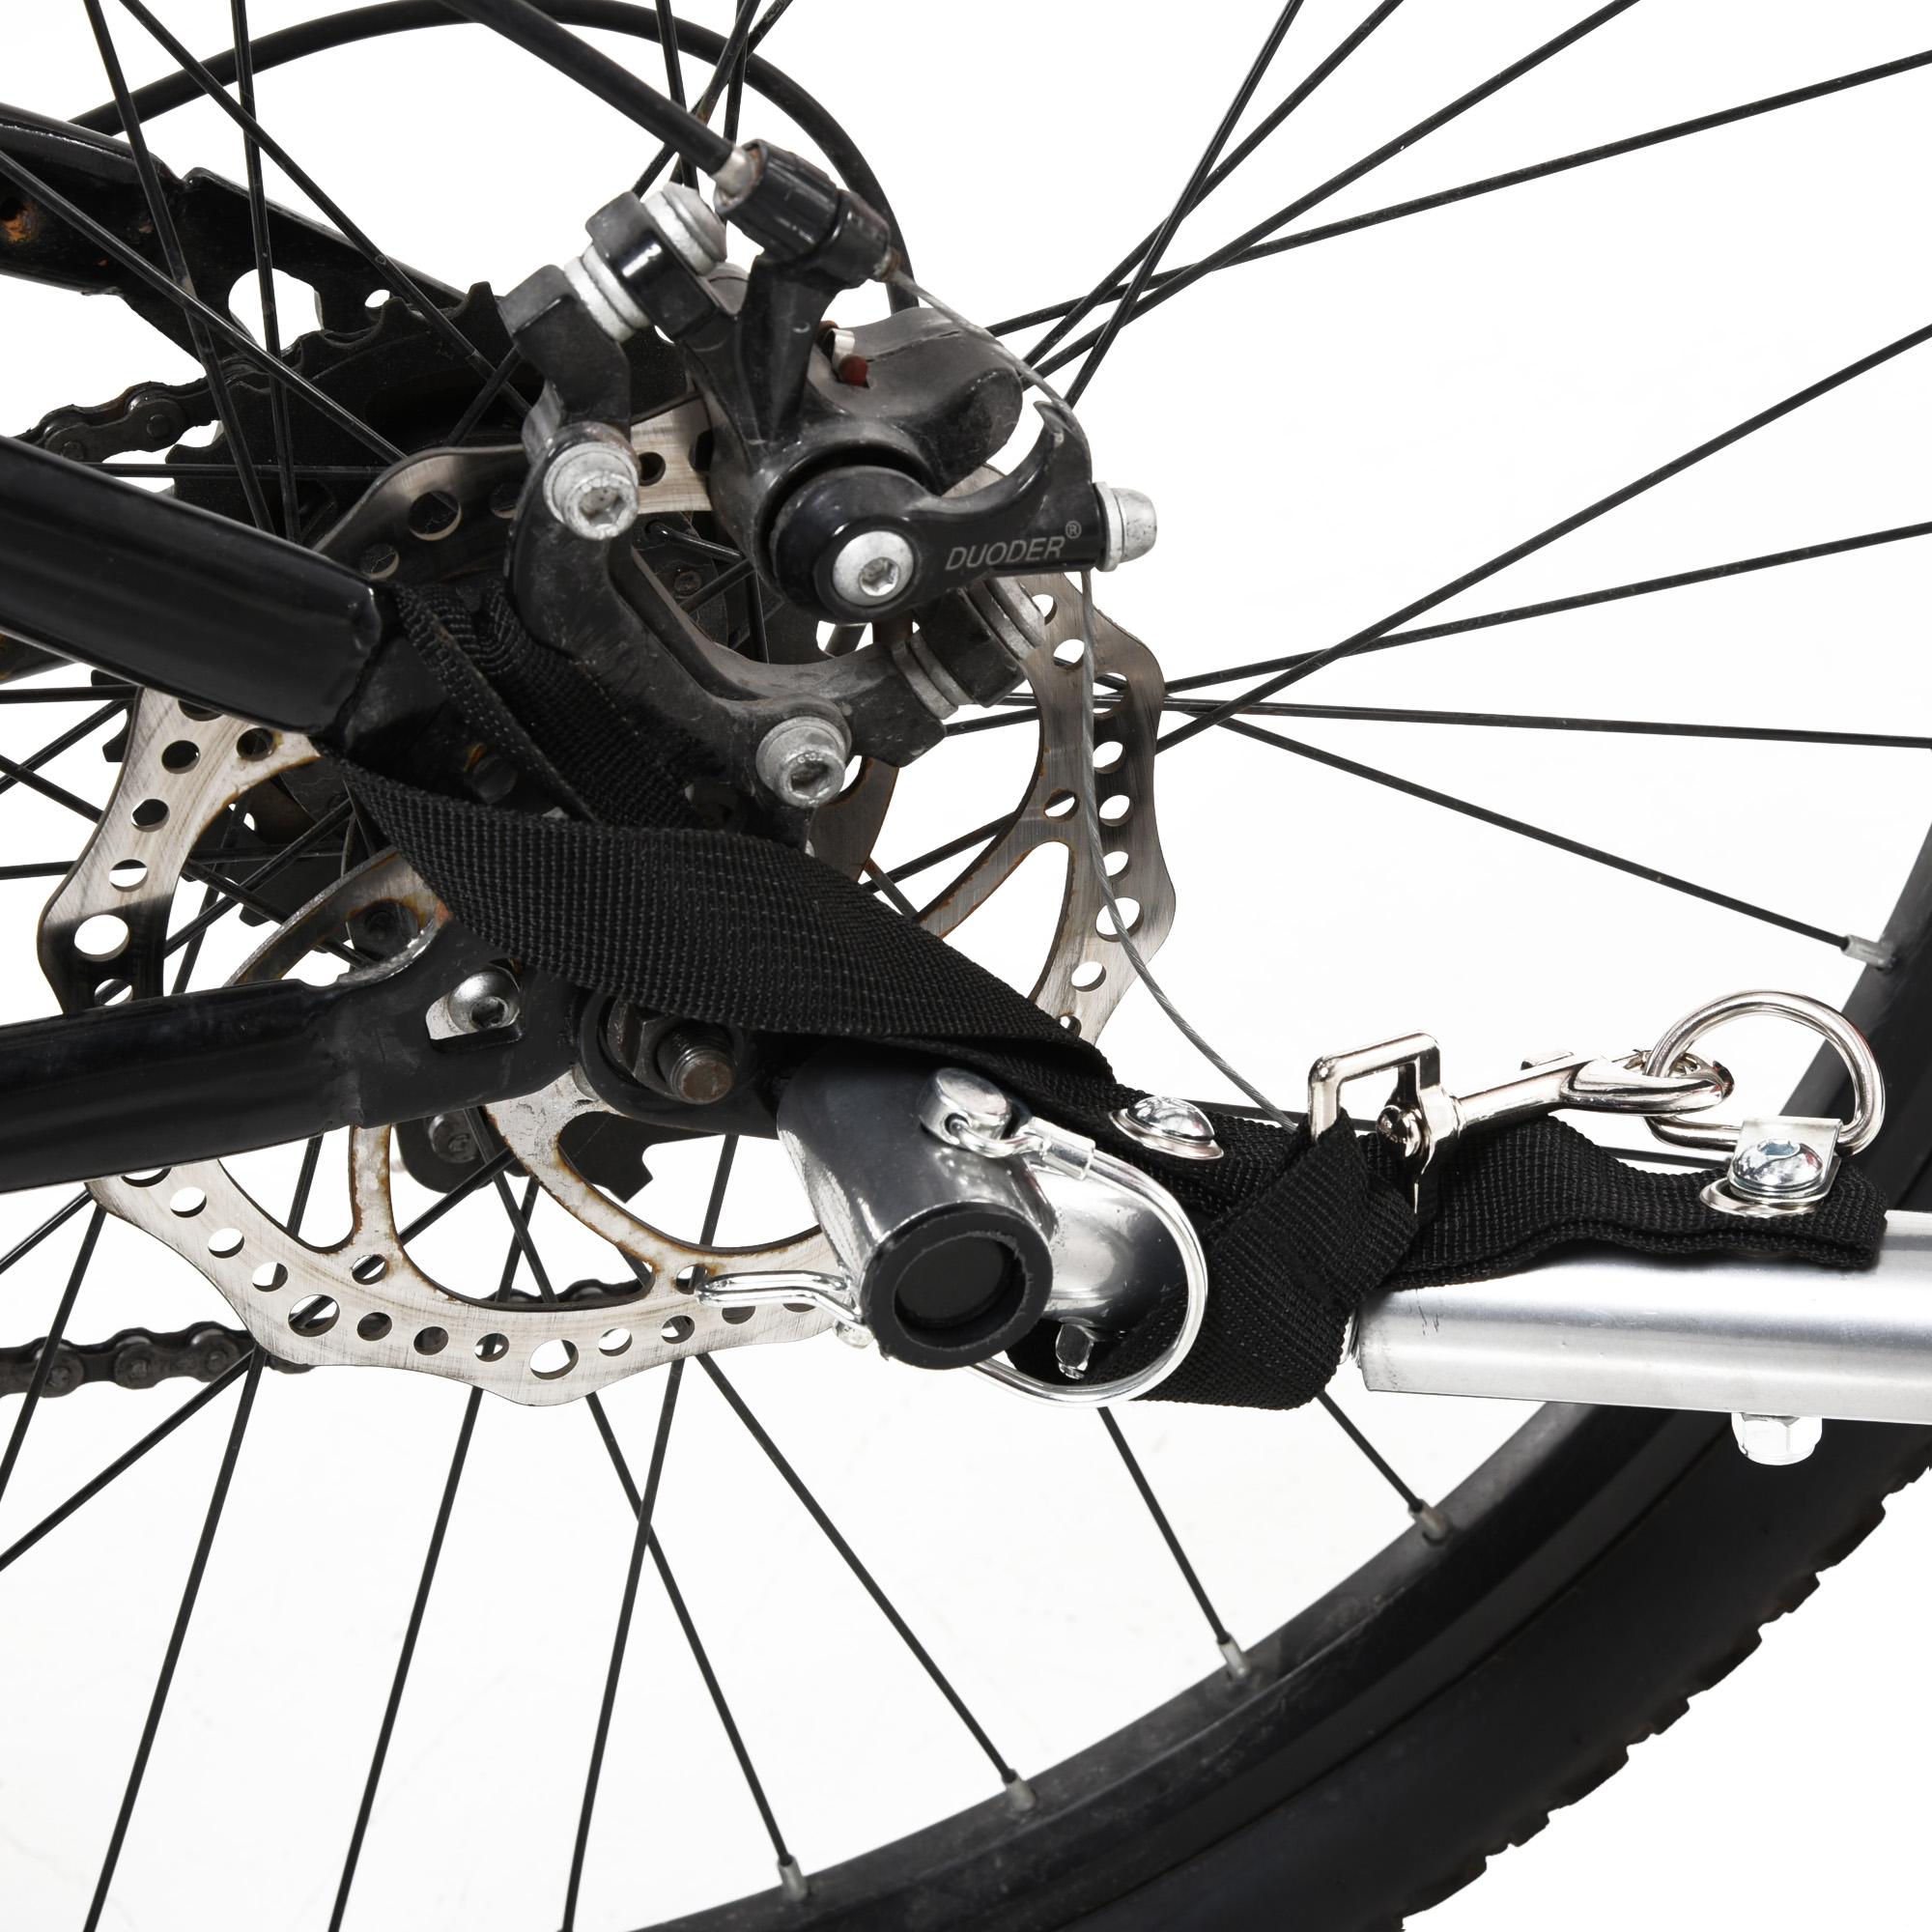 miniatura 12 - Remolque Bicicleta Niño 2 PLAZAS+Amortiguador Kit Footing Freno Bandera Cubierta